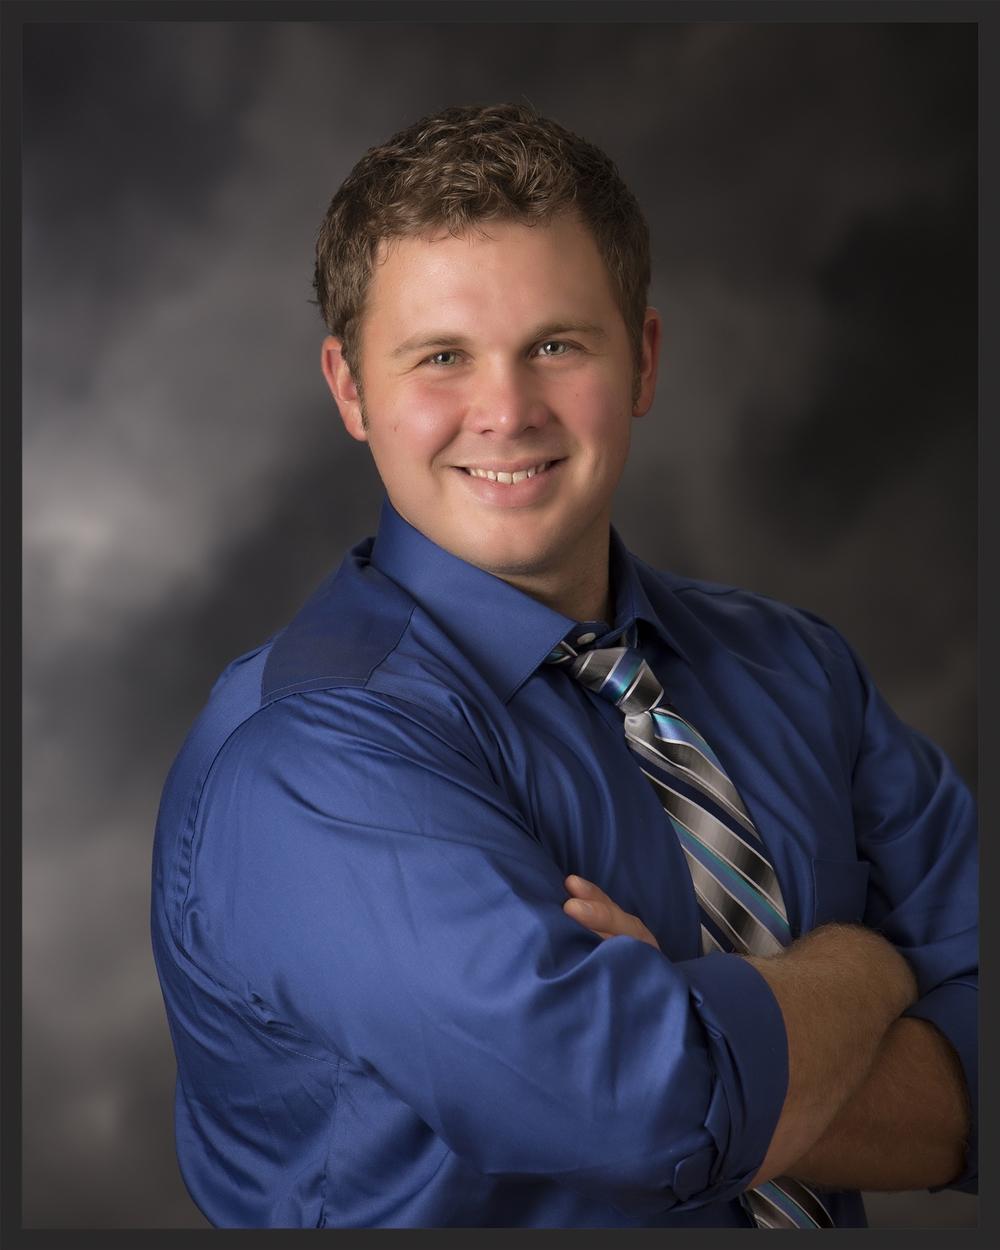 Lee Murphy, REALTOR   502-523-3403  lee.murphy@smithclick.com